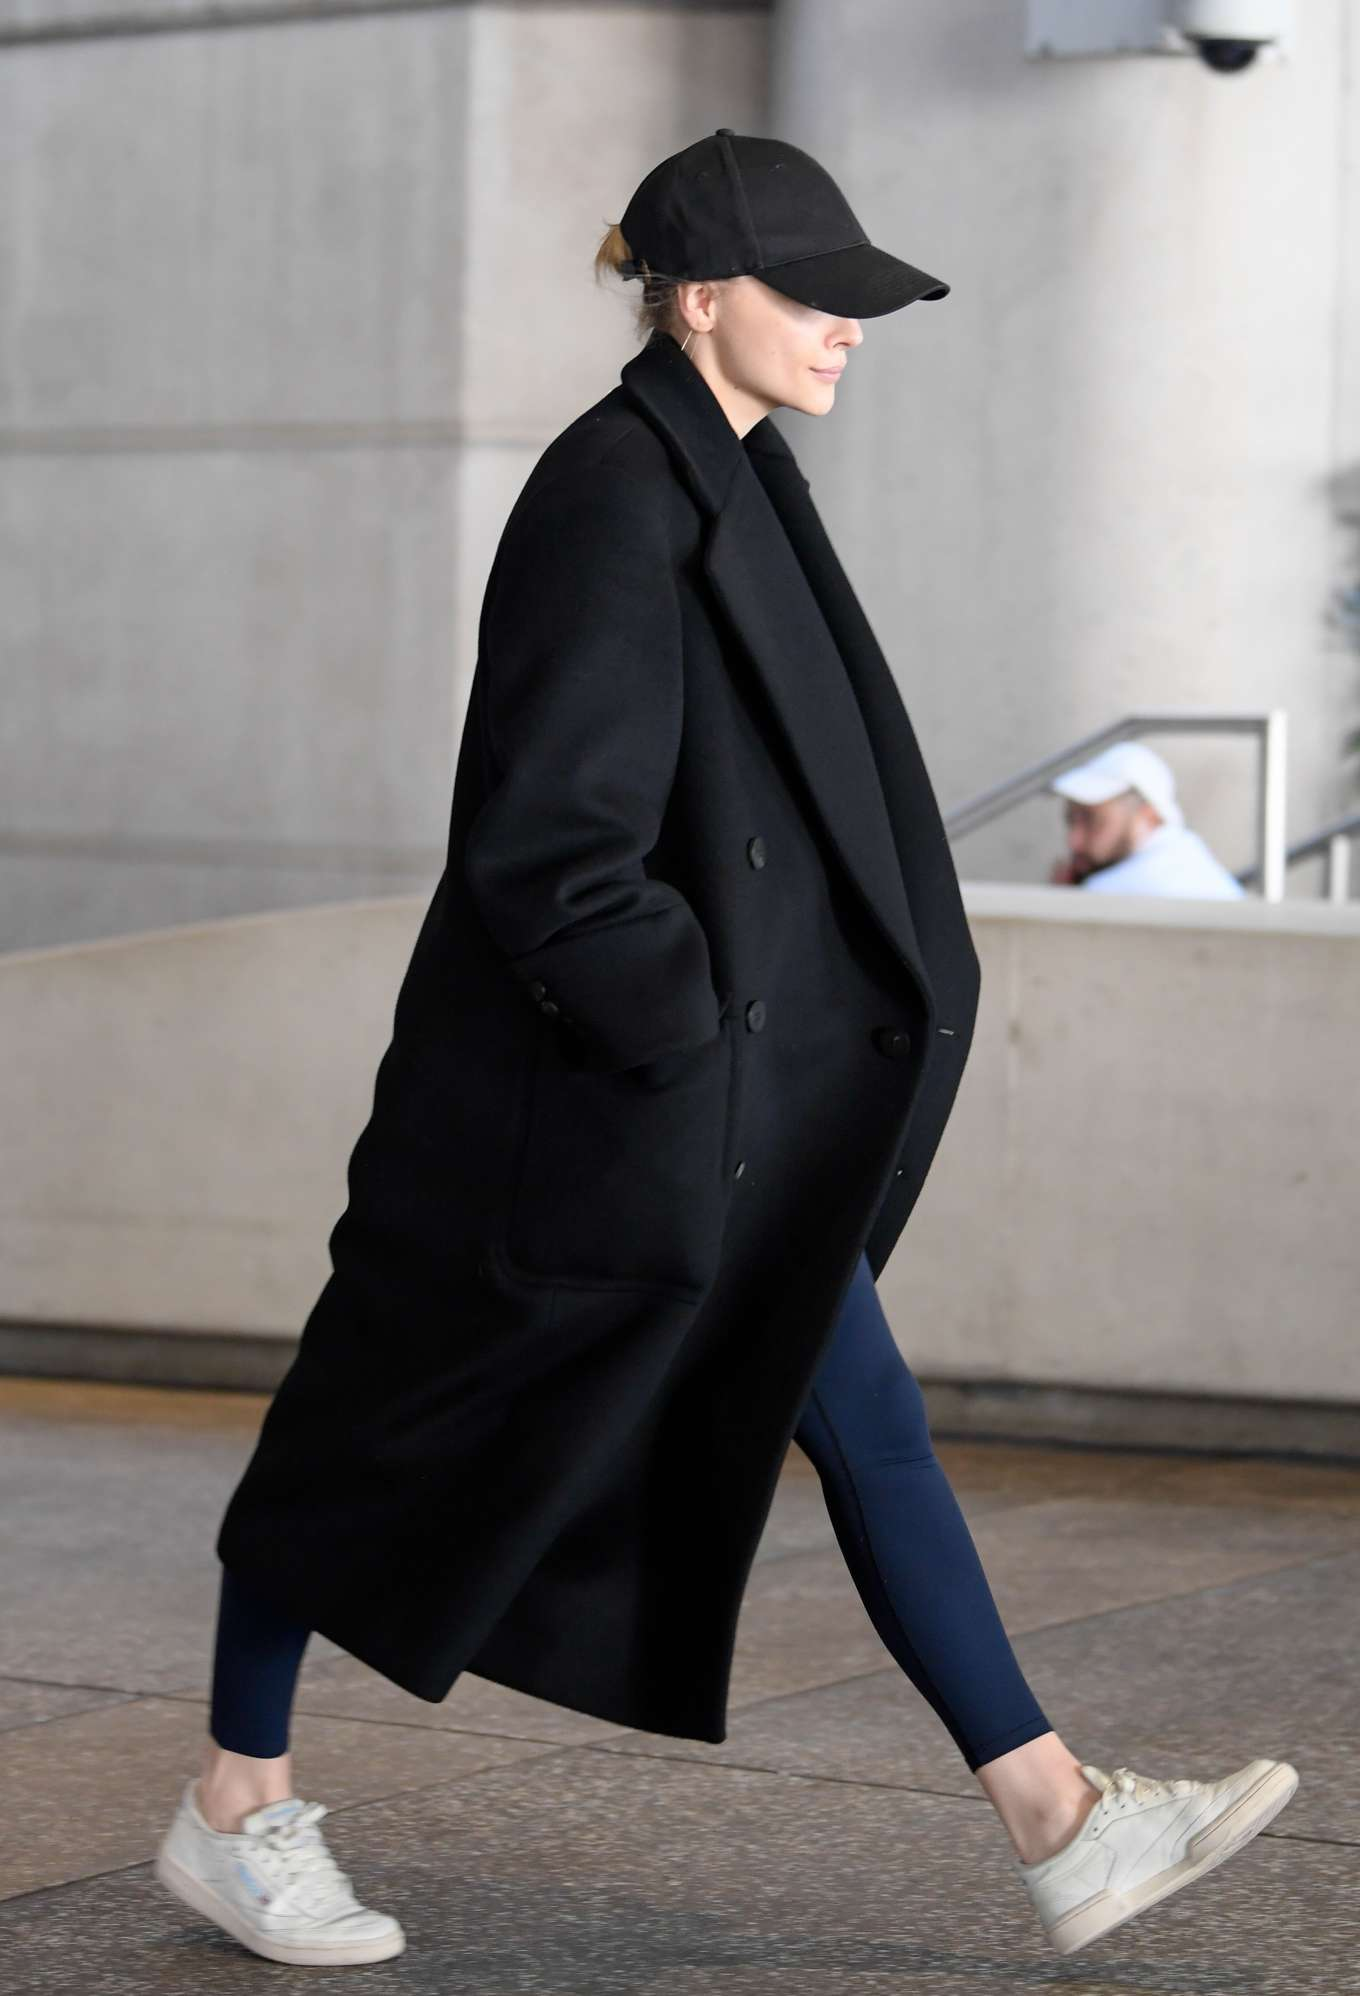 Chloe Grace Moretz - arriving to Los Angeles International Airport